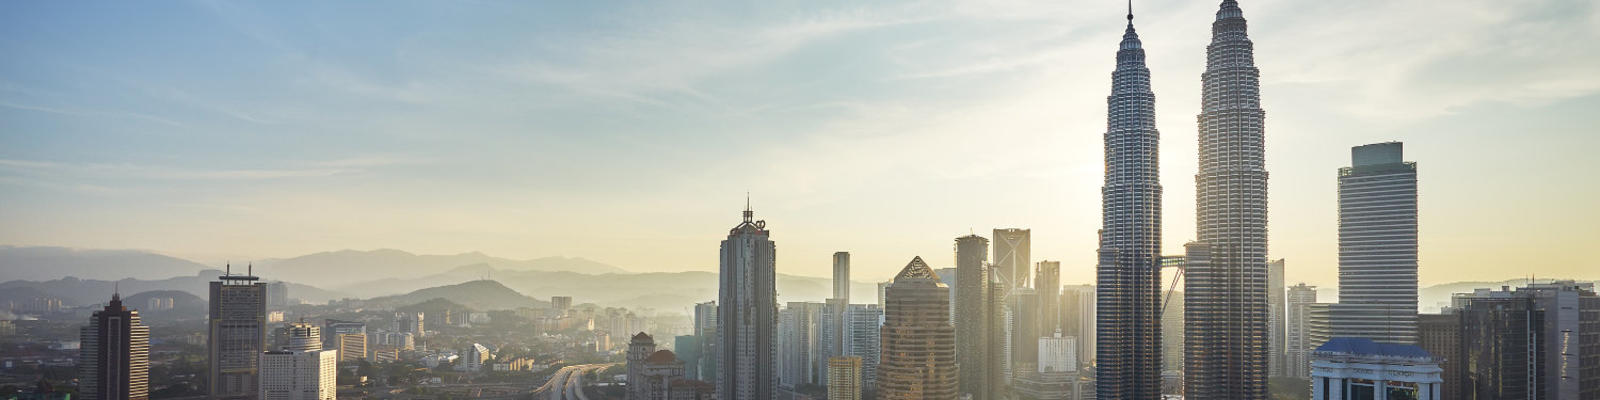 A view of the Kuala Lumpur skyline.